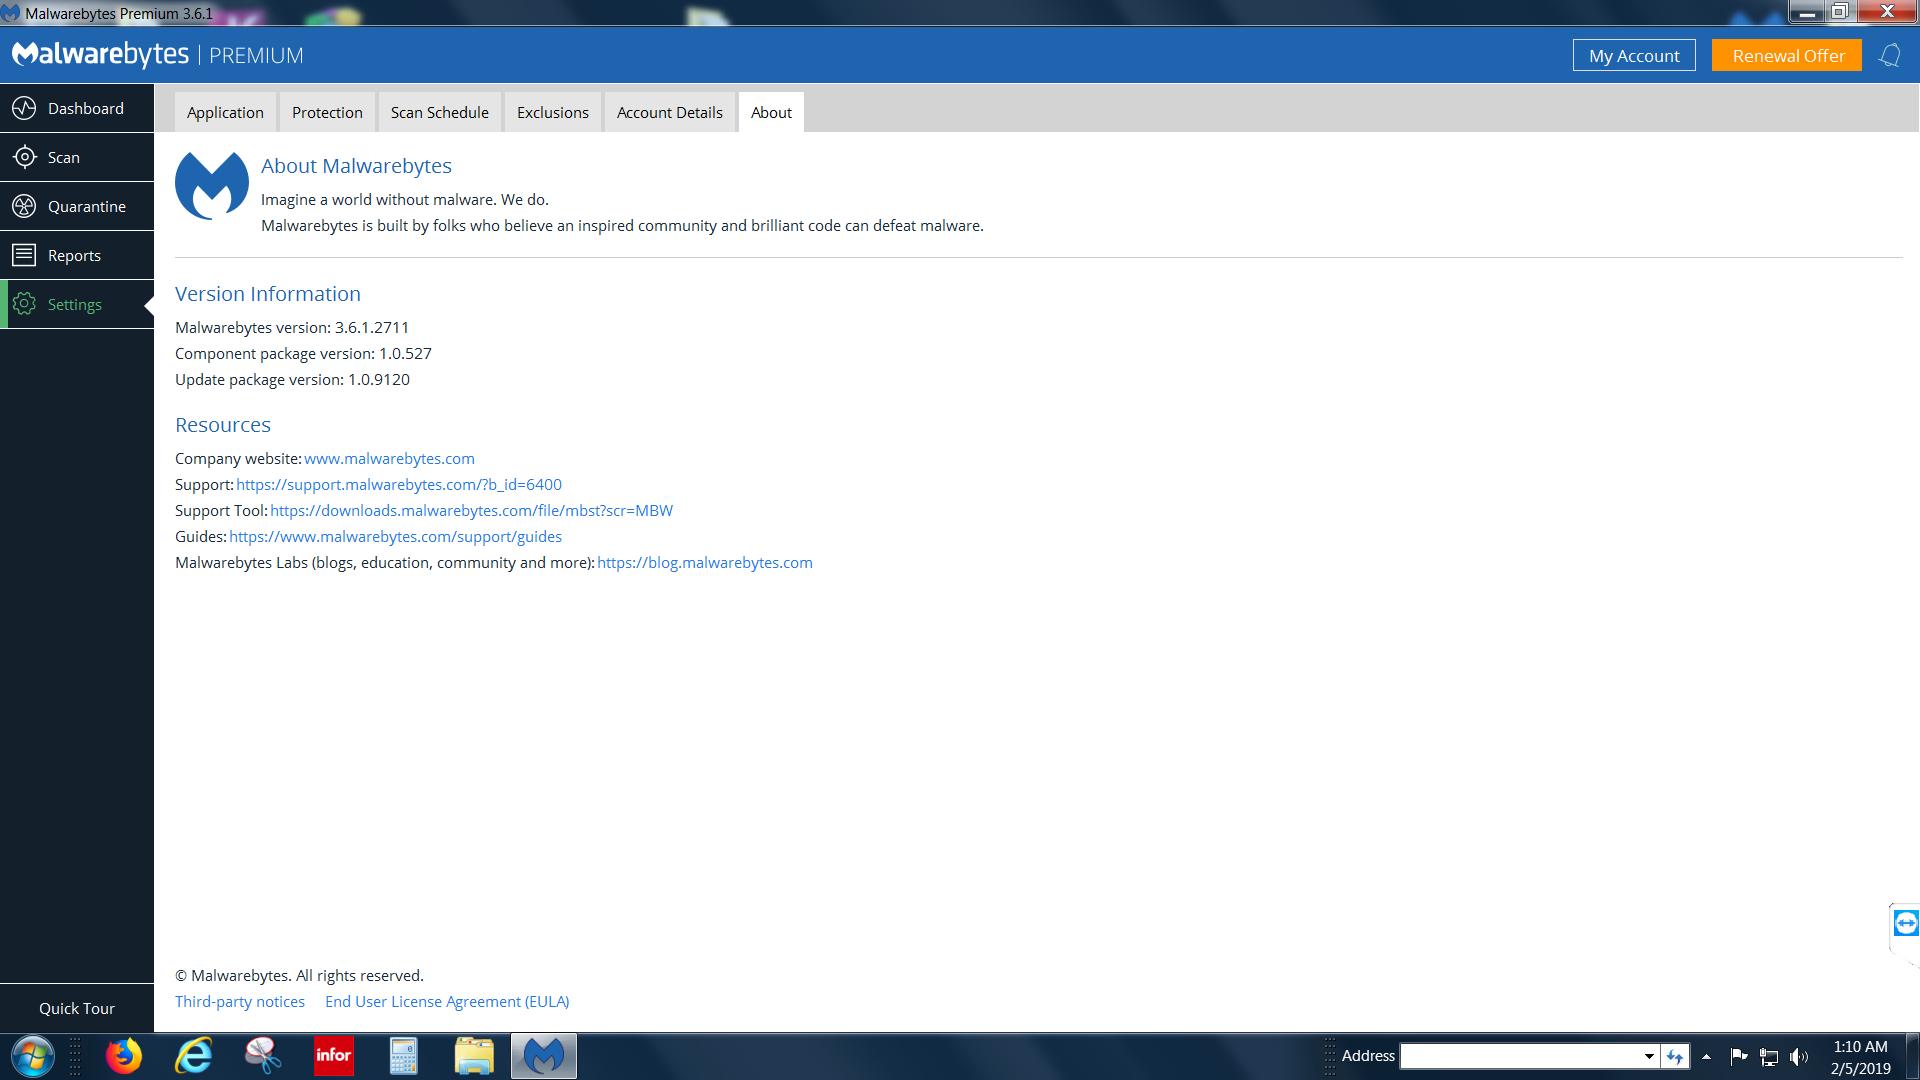 malwarebytes for windows 7 home premium 64 bit